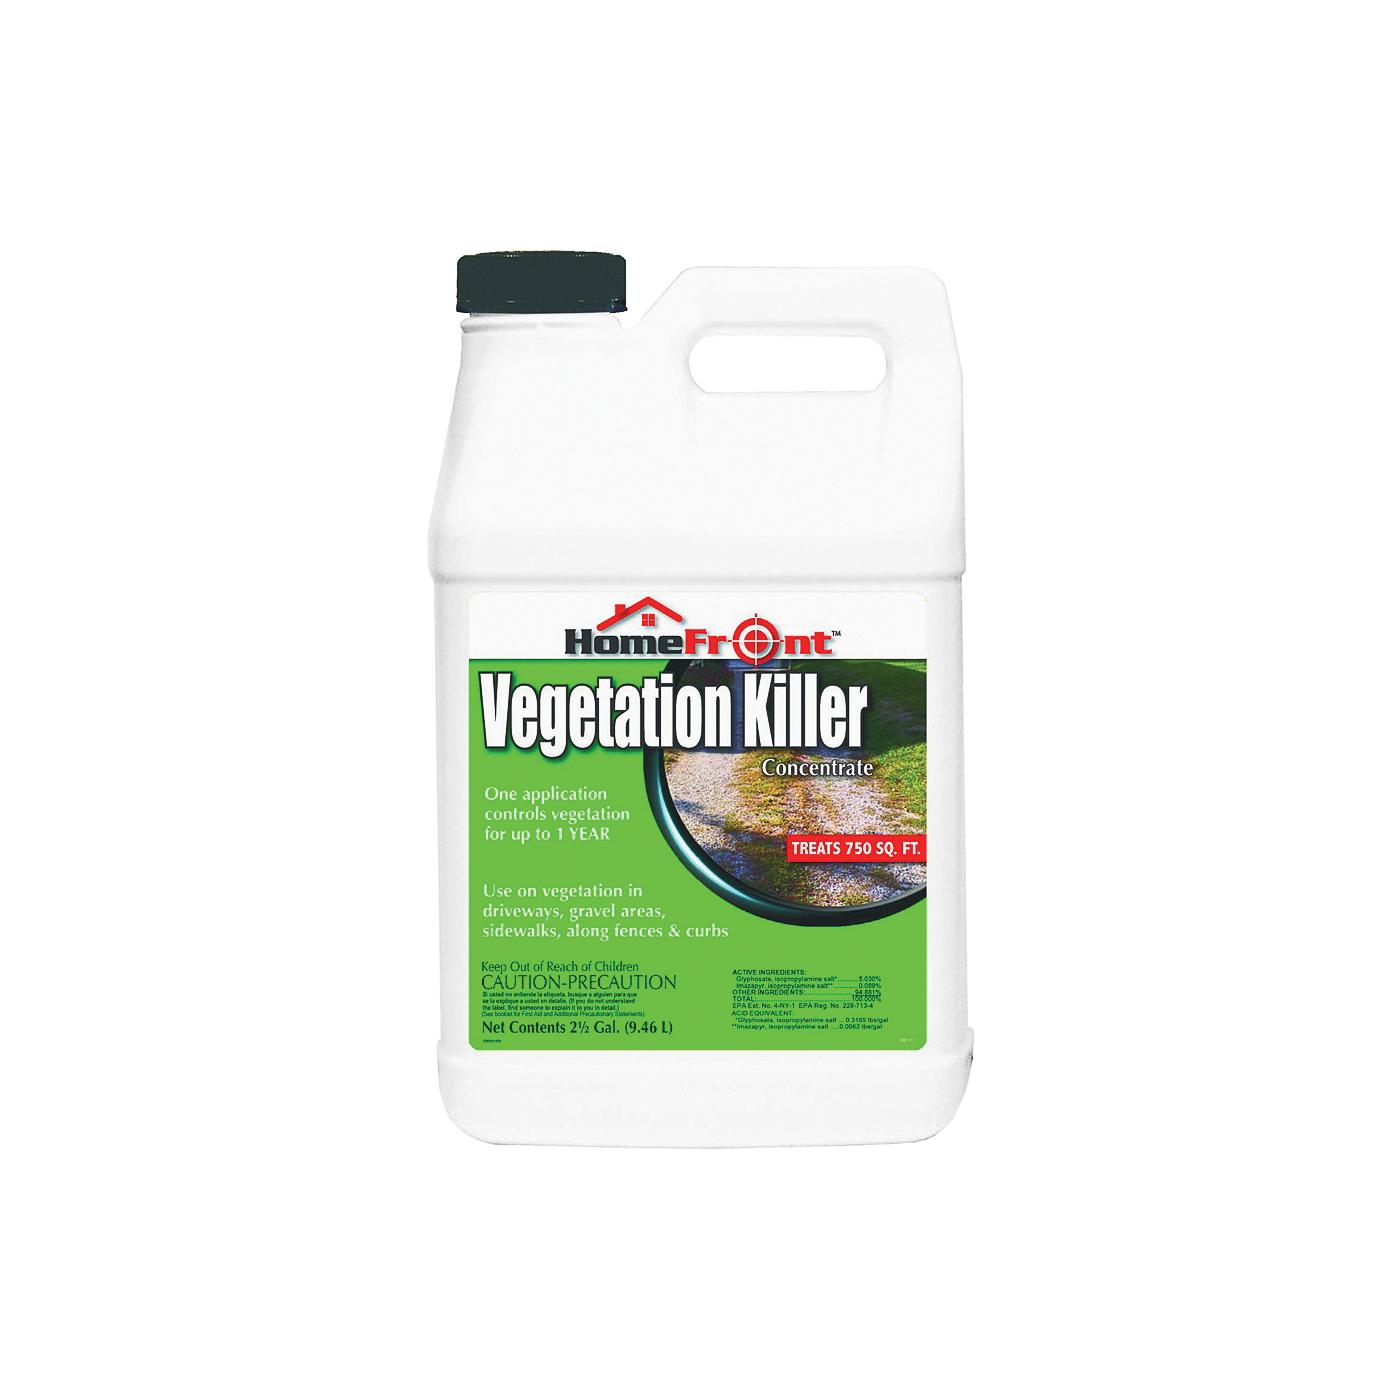 Picture of Bonide 105141 Vegetation Killer, Liquid, Amber/Light Brown, 2.5 gal Package